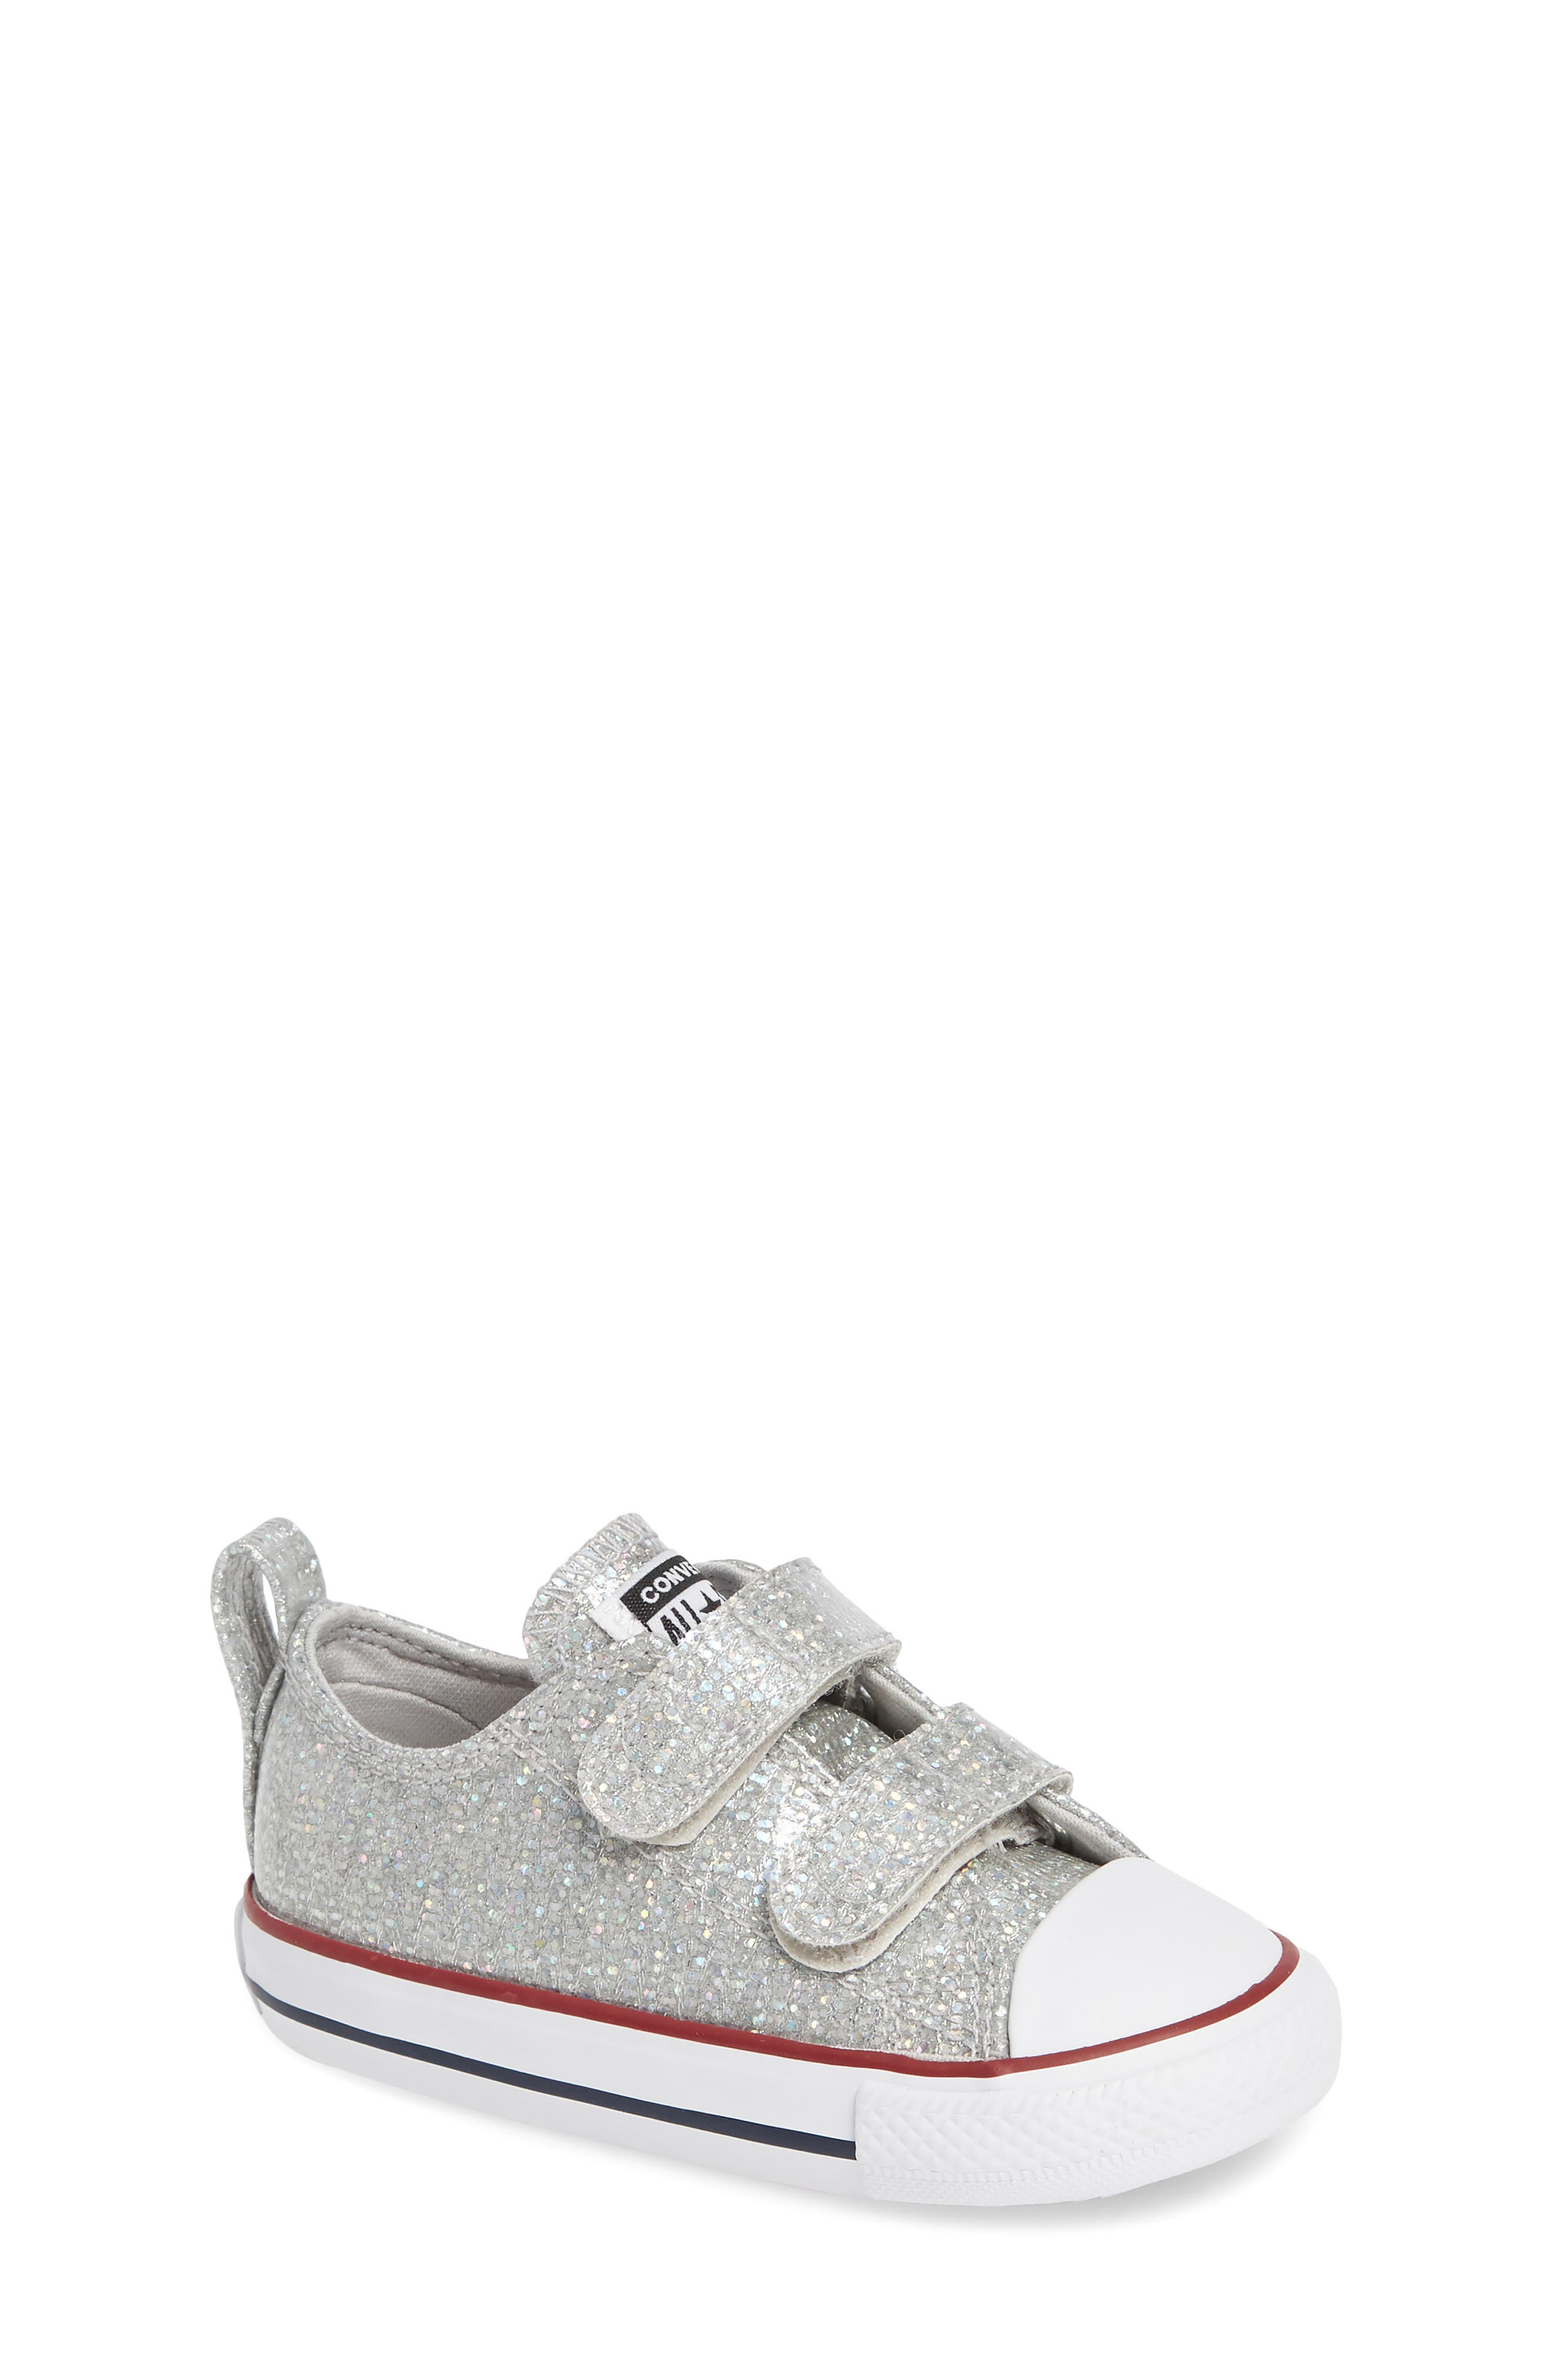 All Star<sup>®</sup> Seasonal Glitter Sneaker, Main, color, 050